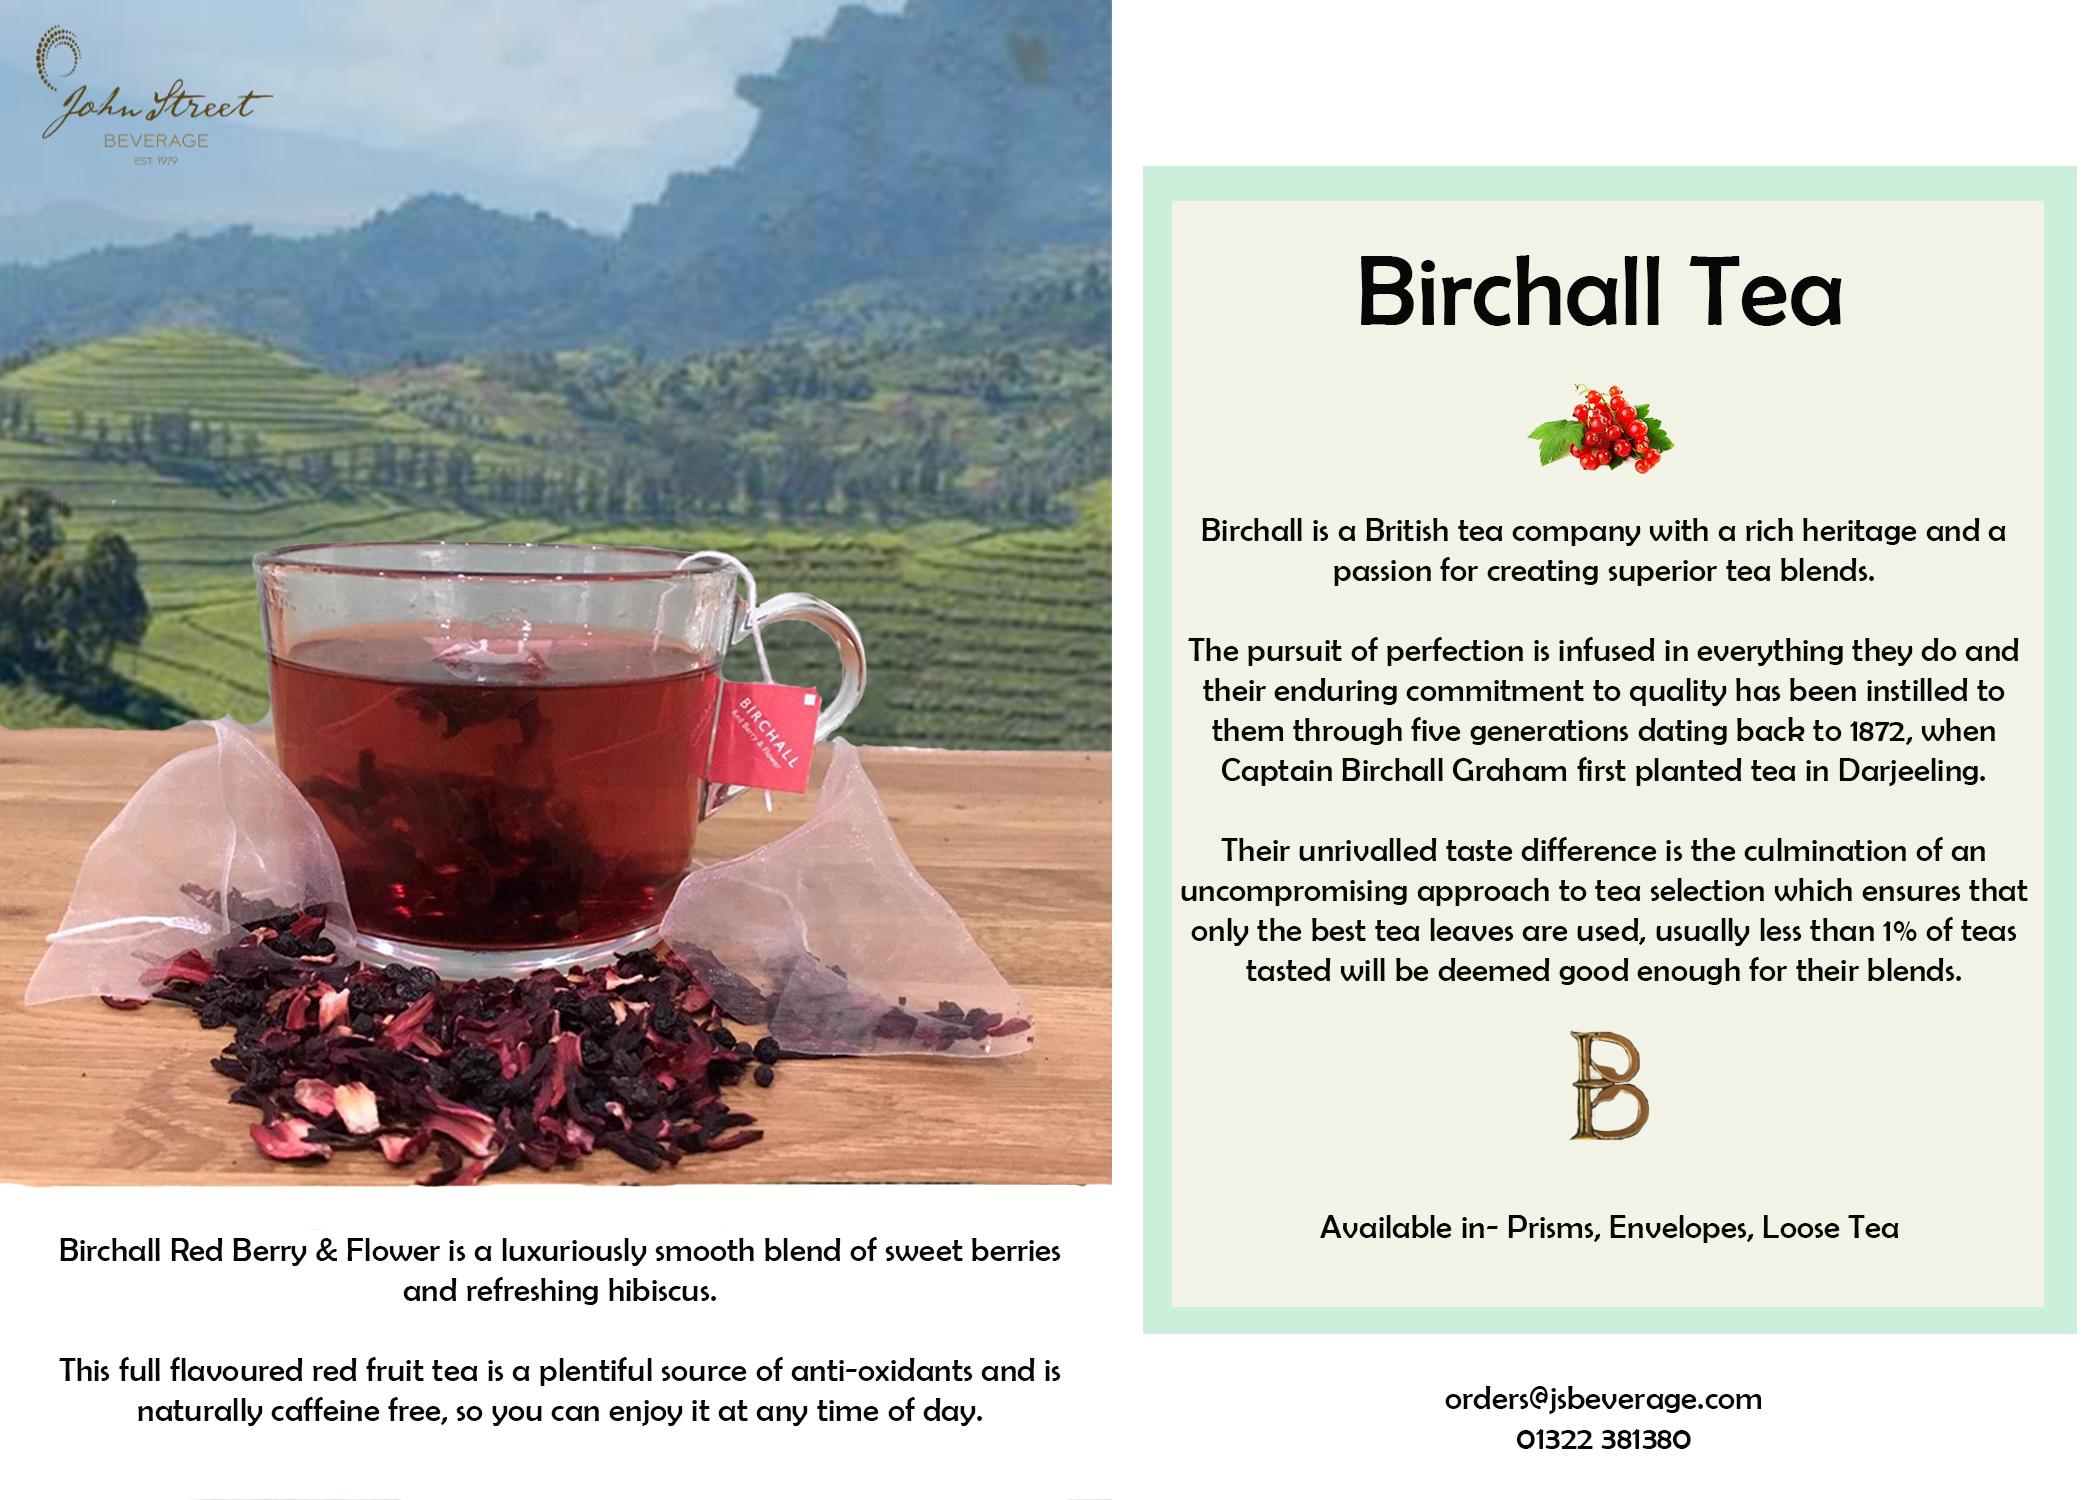 Birchall Red Berry & Flower